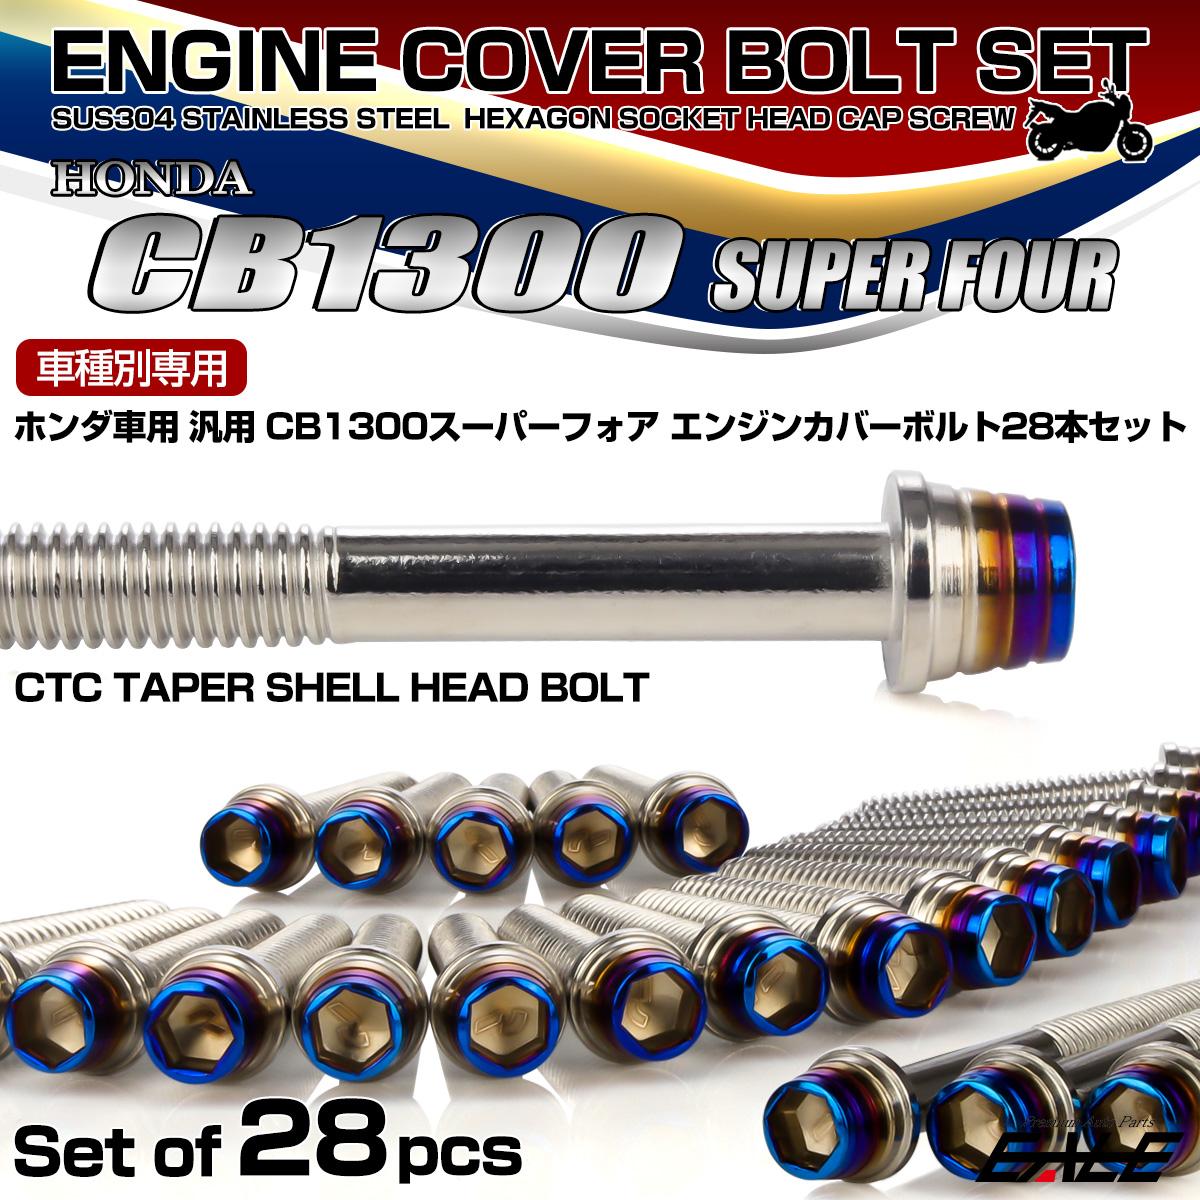 CB1300SF エンジンカバーボルトセット 28本 ホンダ車用 スーパーフォア CTCテーパーシェルヘッド シルバー&焼きチタン TB6286